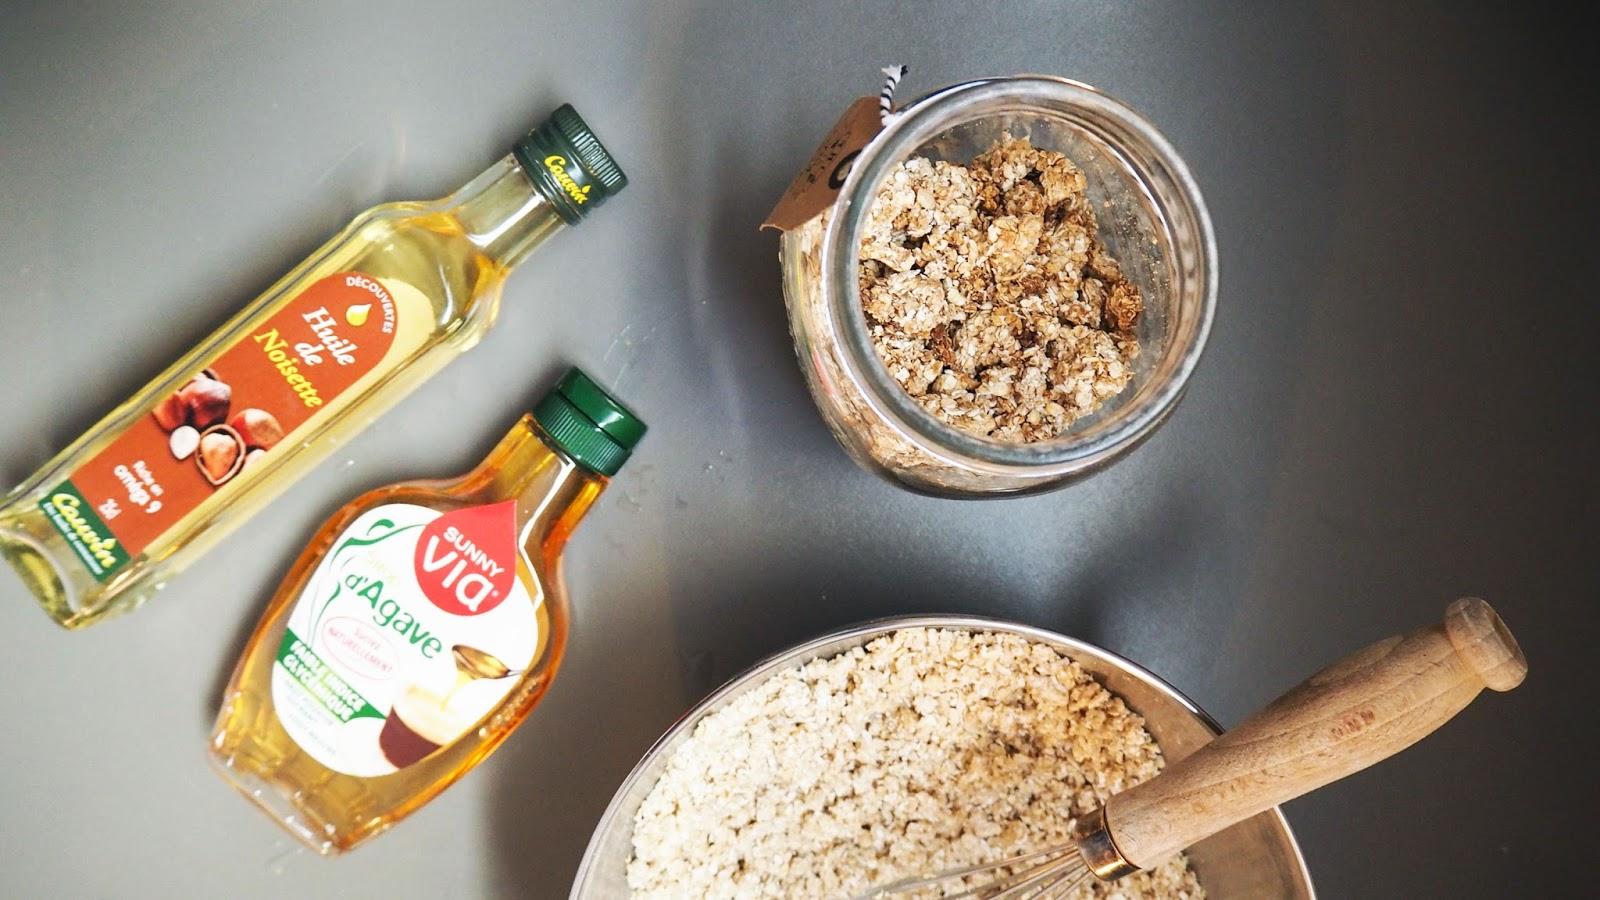 Flocon avoine recette muesli